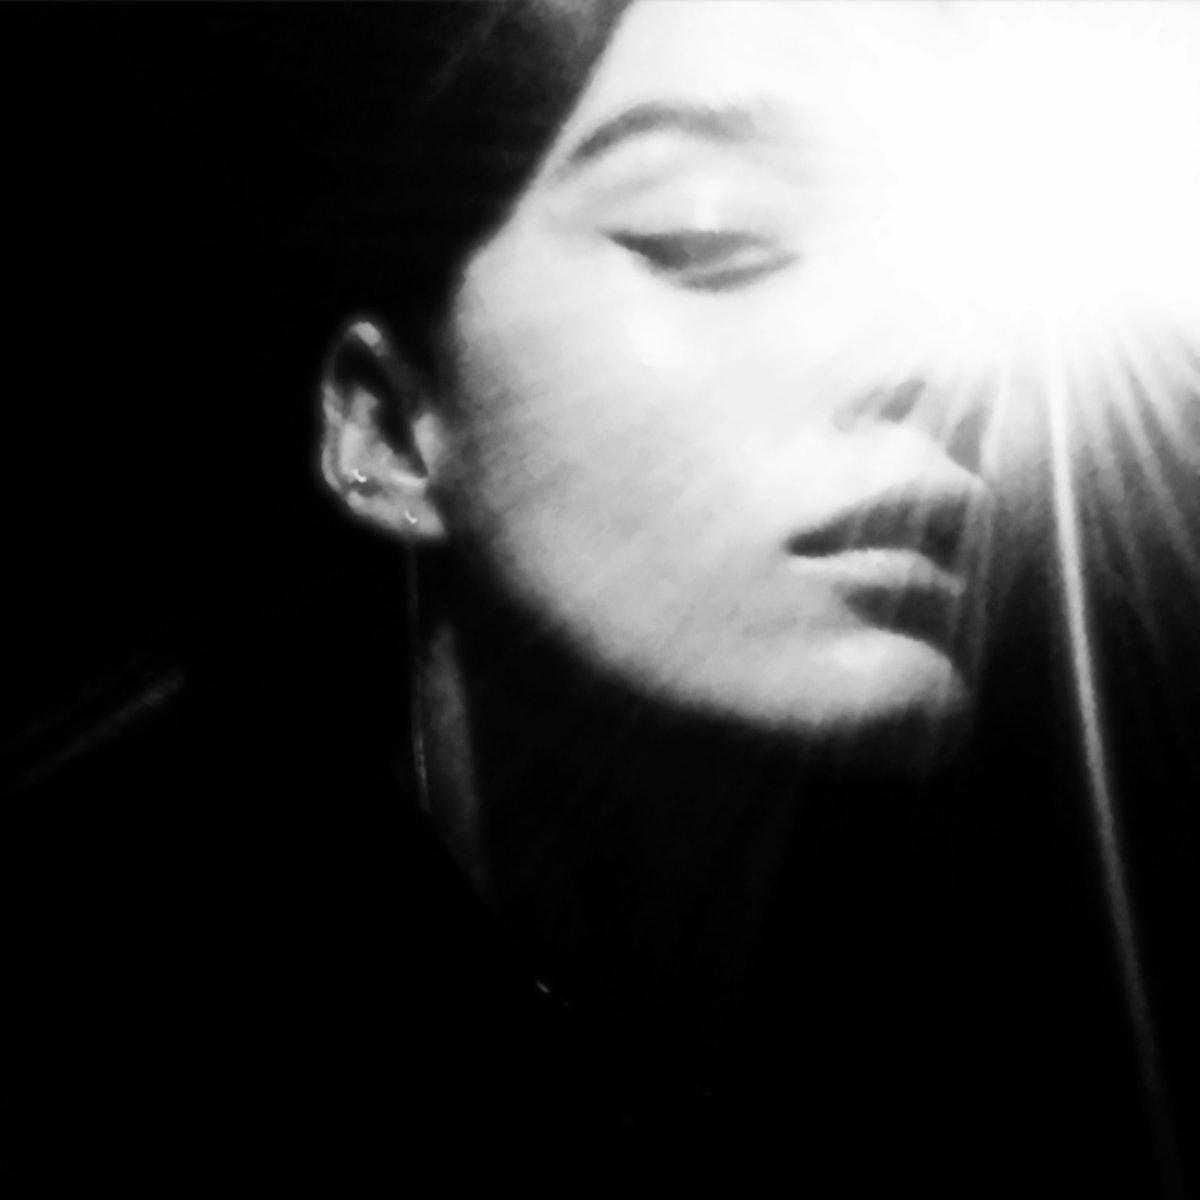 Crystal Renn Shares Her Artful Photo Diary